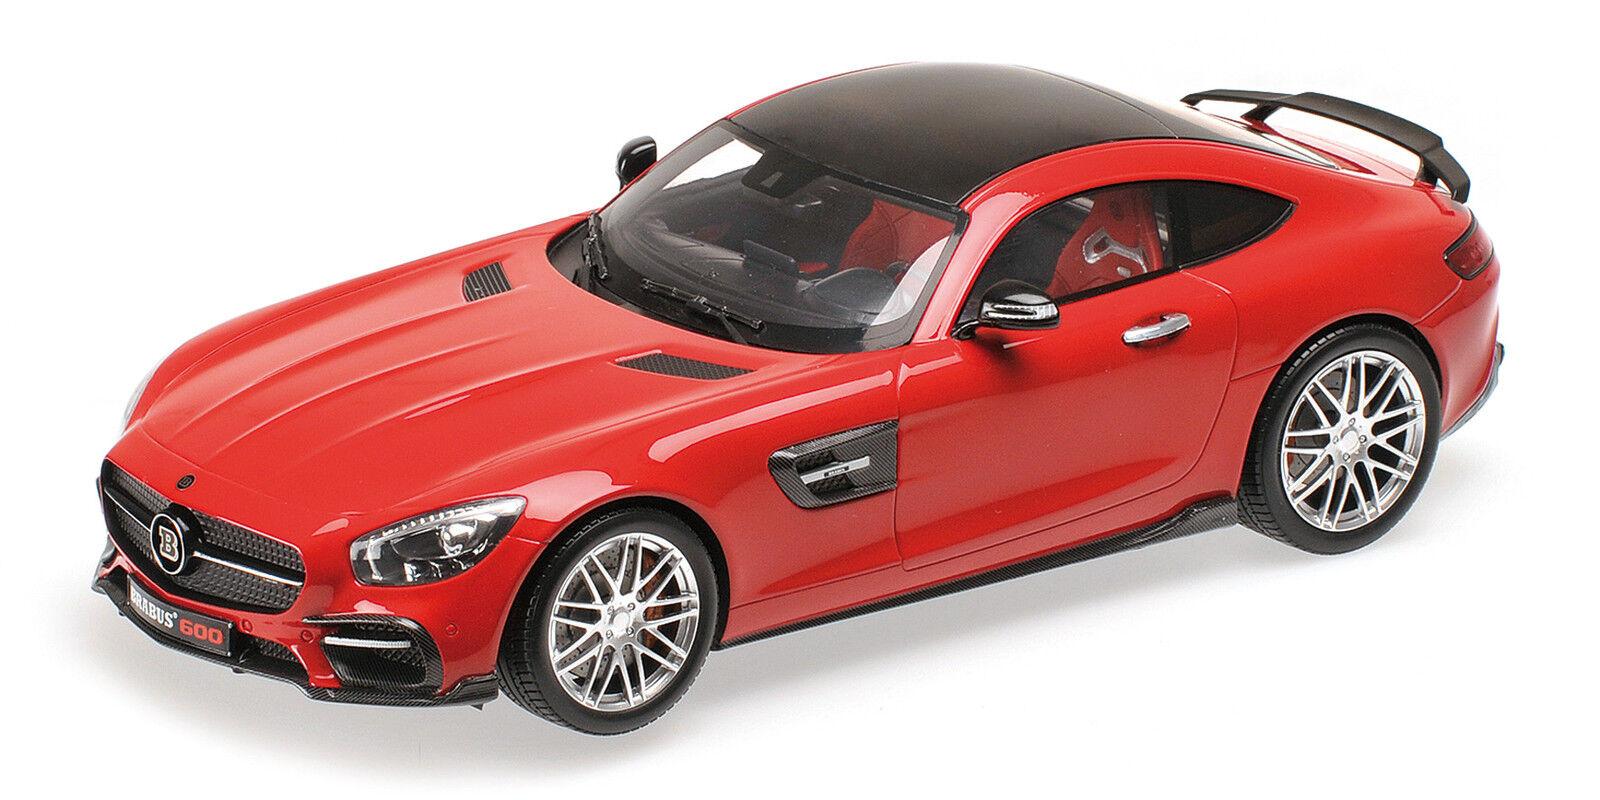 Brabus 600 Auf Basis Mercedes Benz Amg Gt S 2016 rouge 1 18 Model MINICHAMPS